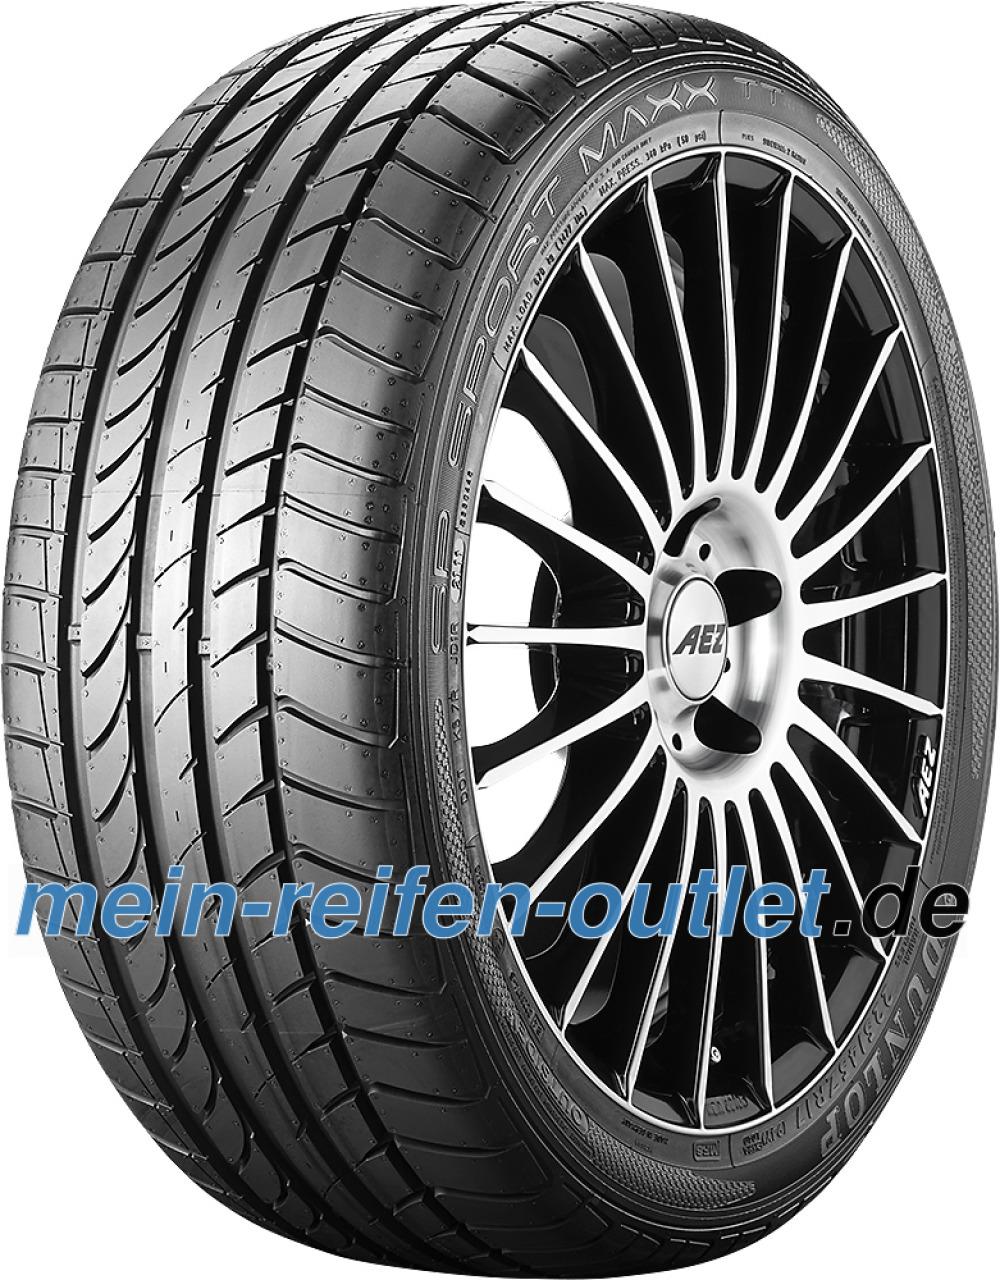 Dunlop SP Sport Maxx TT ( 215/45 ZR17 (91Y) XL mit Felgenschutz (MFS) BLT )